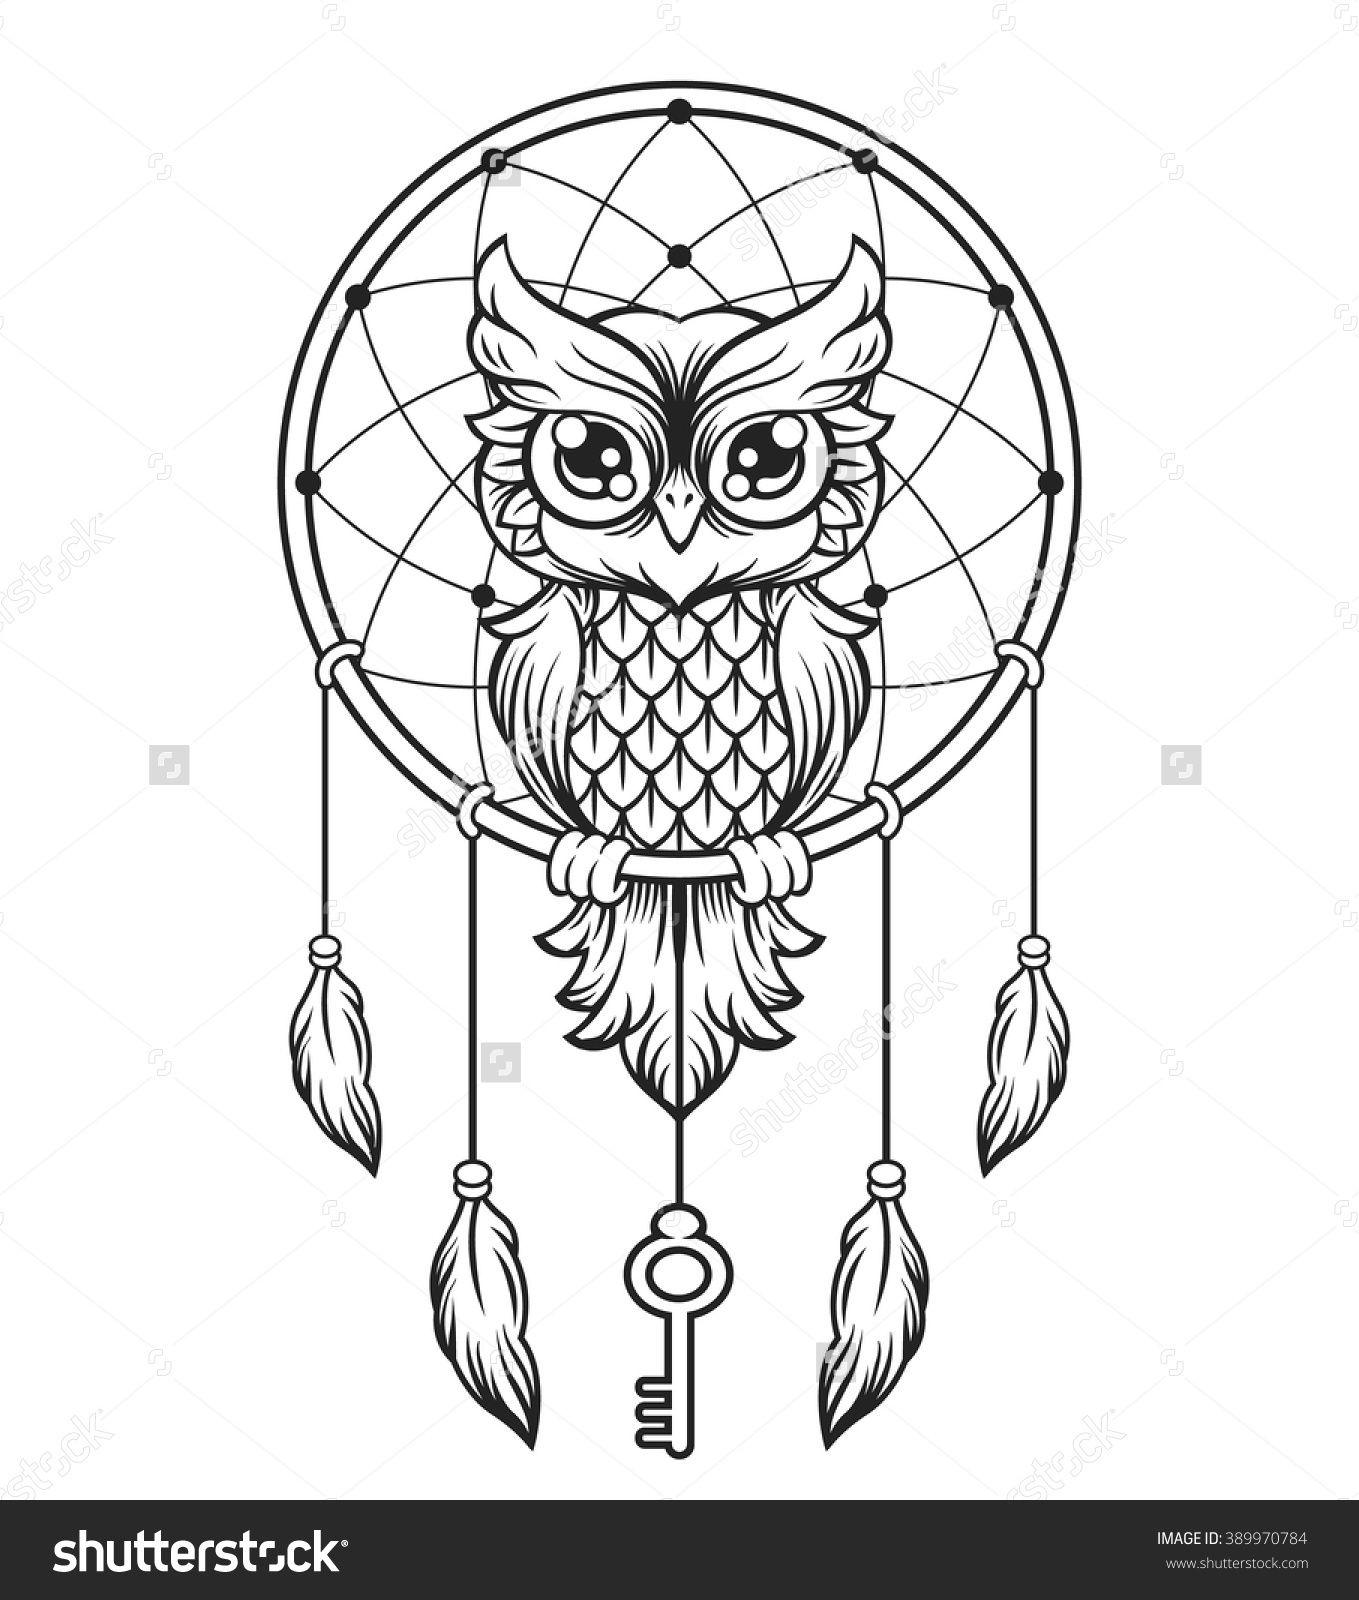 Owl dreamcatcher drawing - photo#30